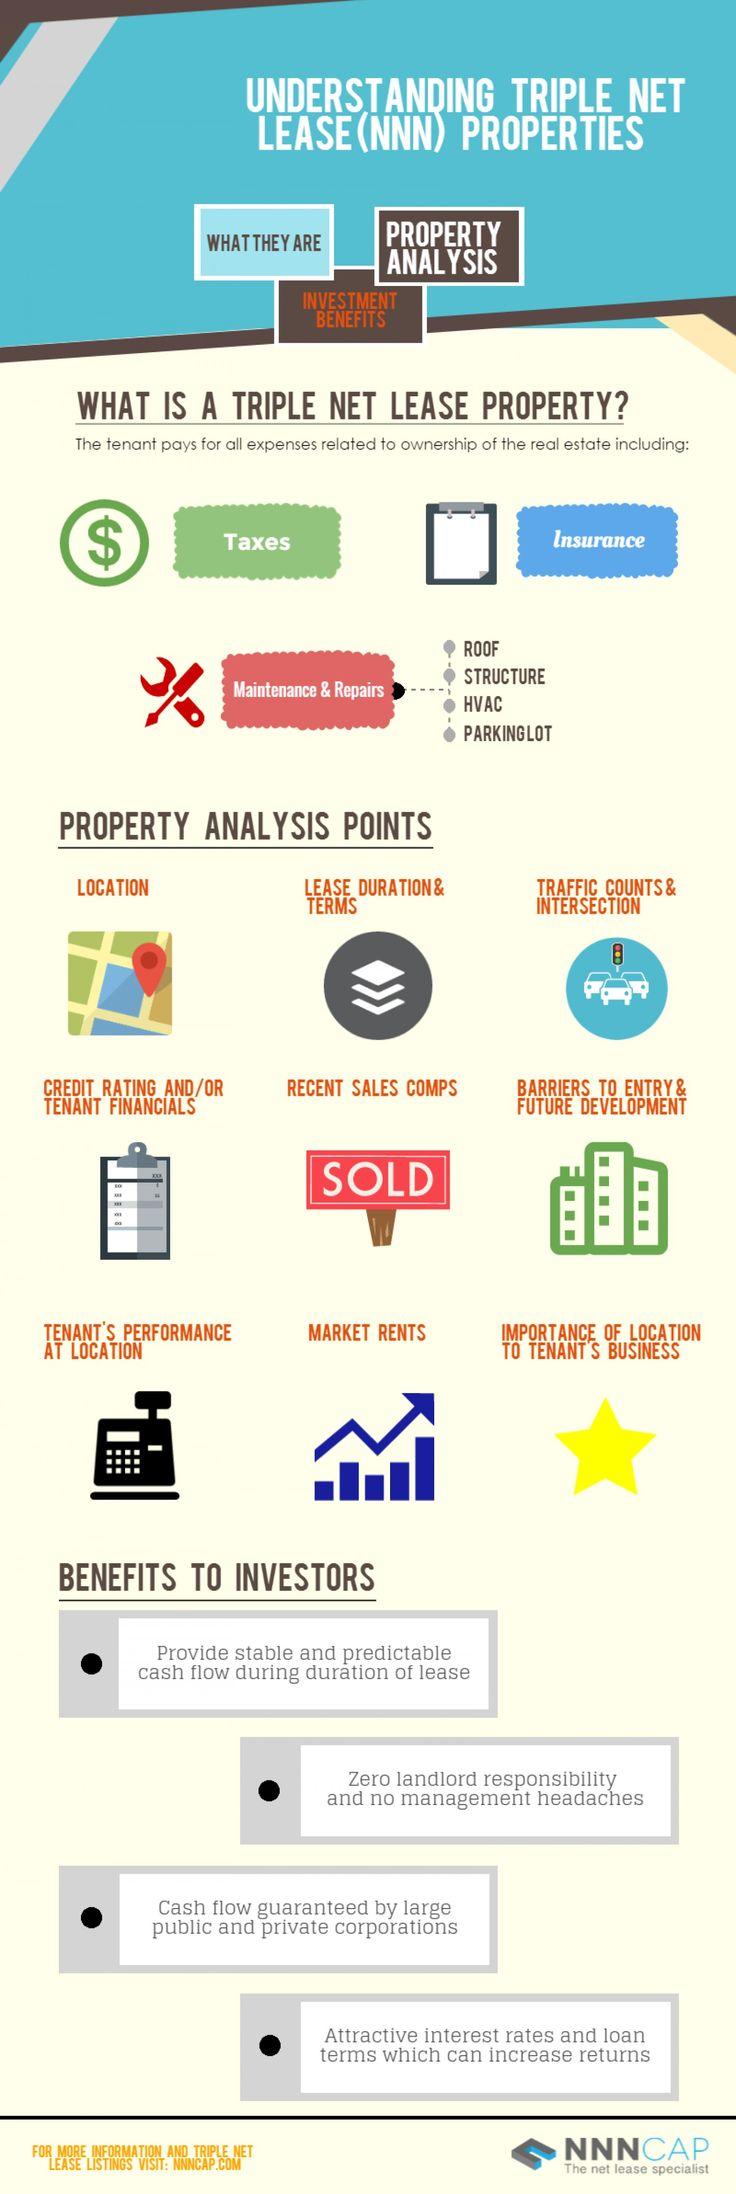 Understanding Triple Net Lease (NNN) Properties Infographic